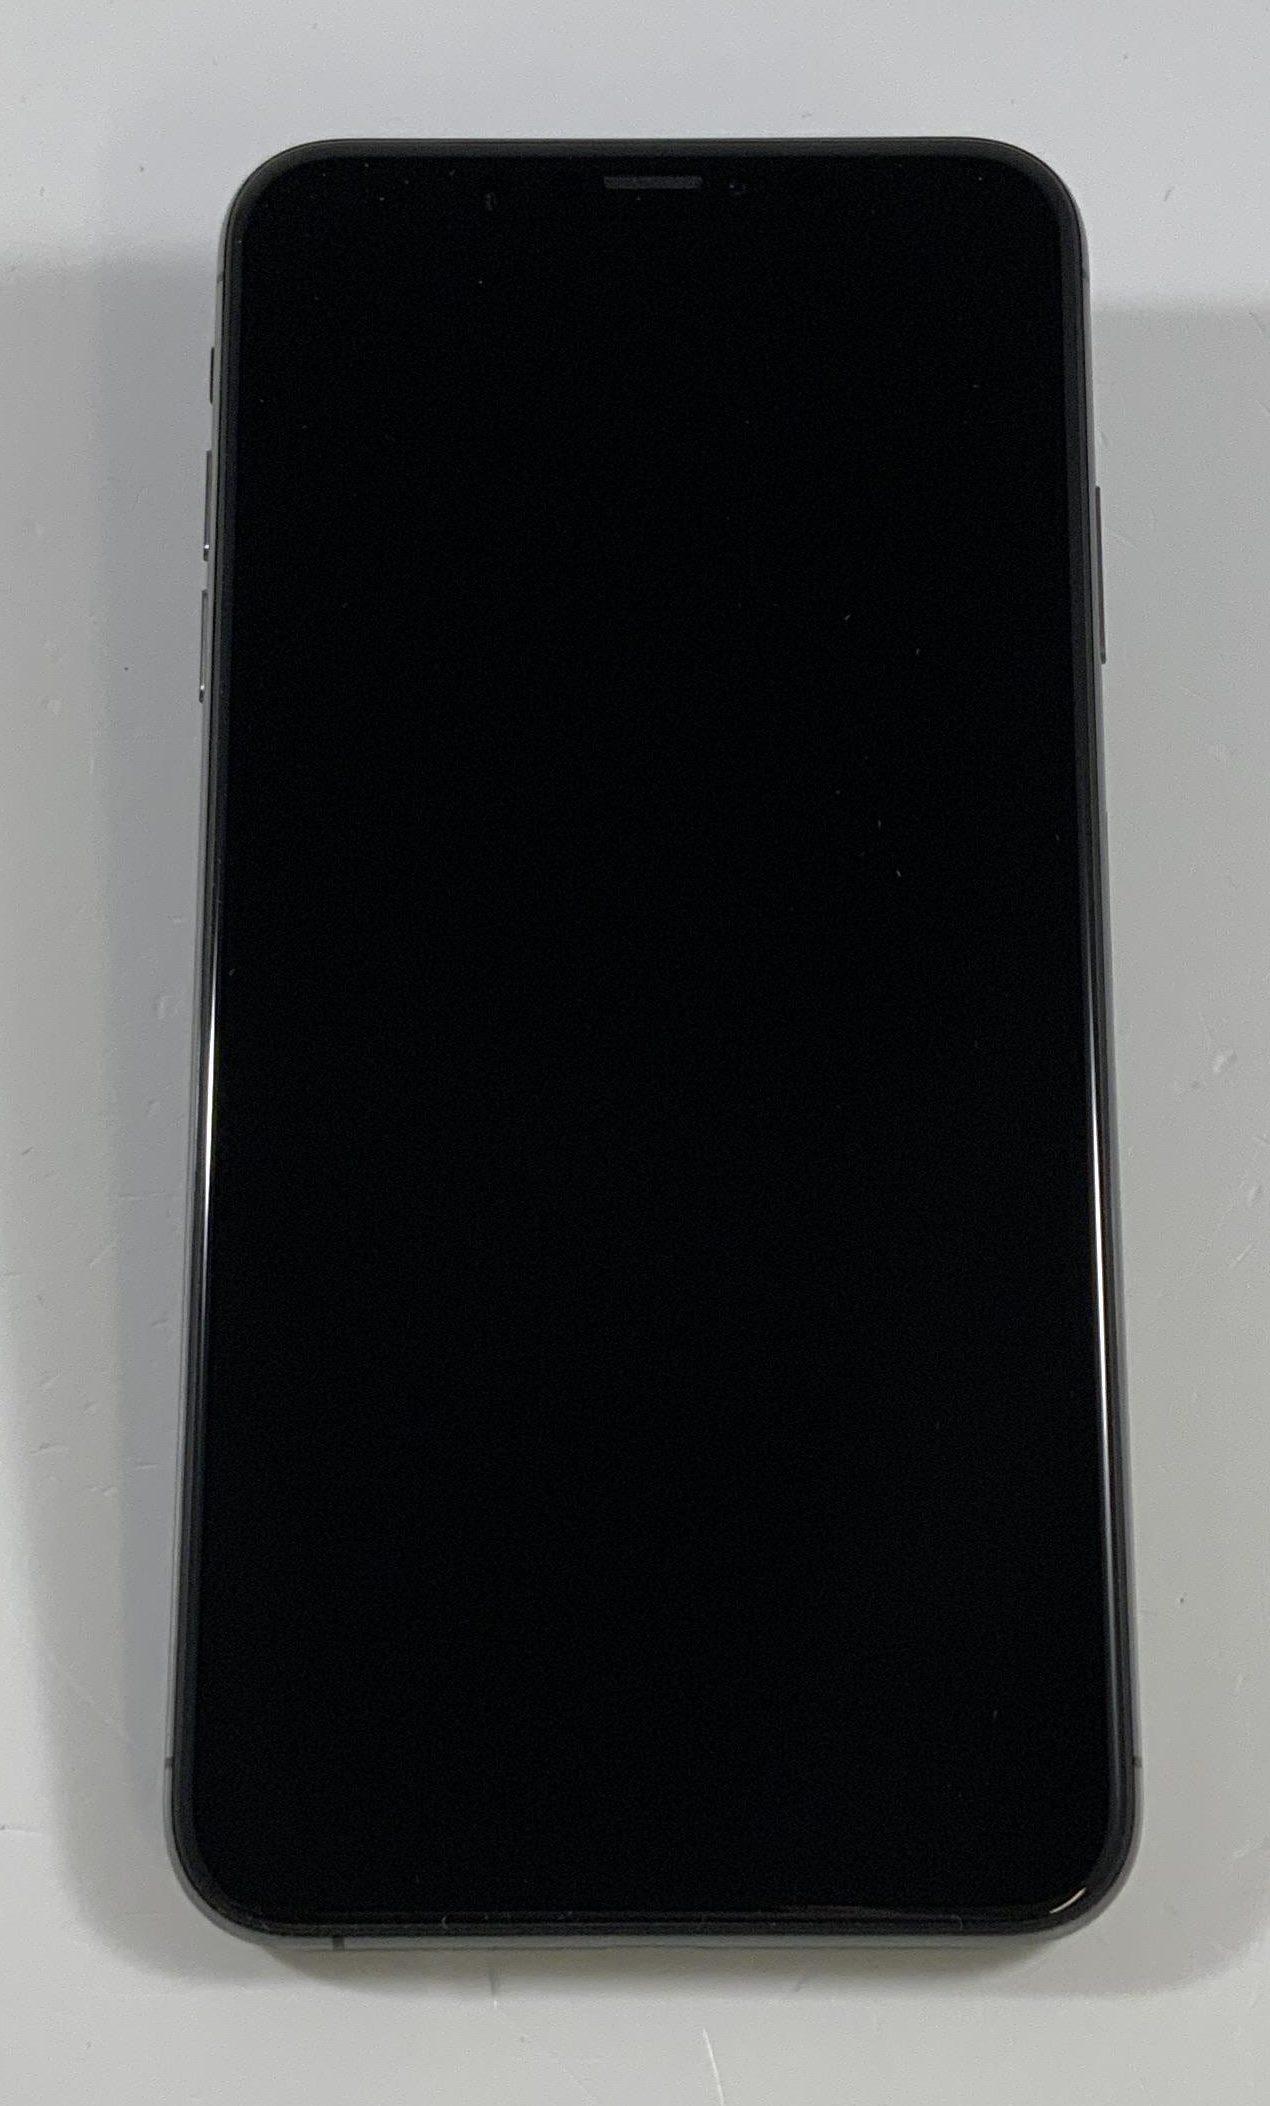 iPhone XS Max 64GB, 64GB, Space Gray, obraz 1